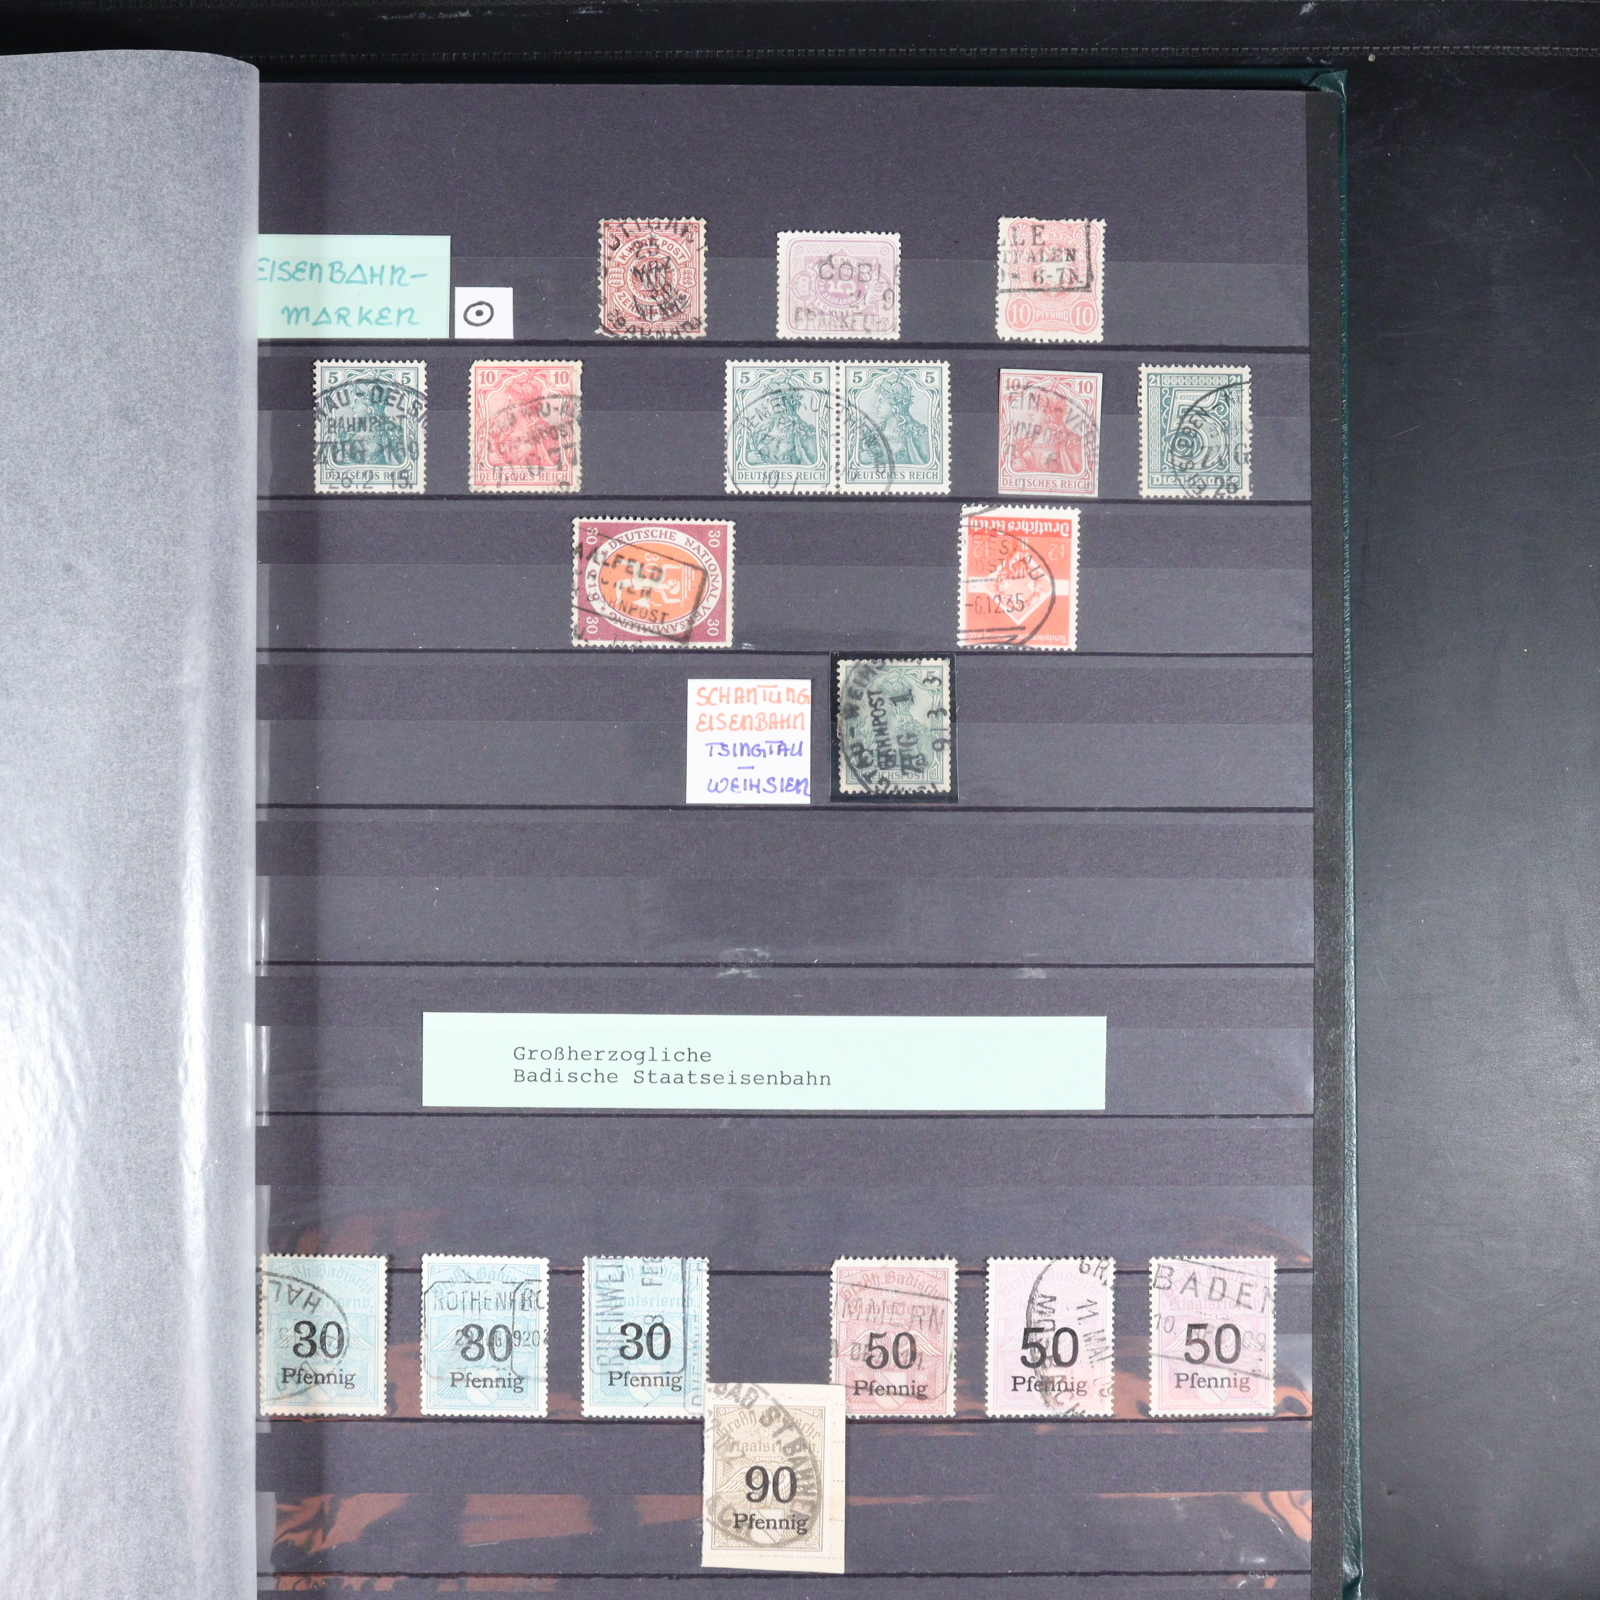 Lot 1294 - COLLECTIONS & ACCUMULATIONS Deutsches Reich -  Auktionshaus Schlegel 26 Public Auction